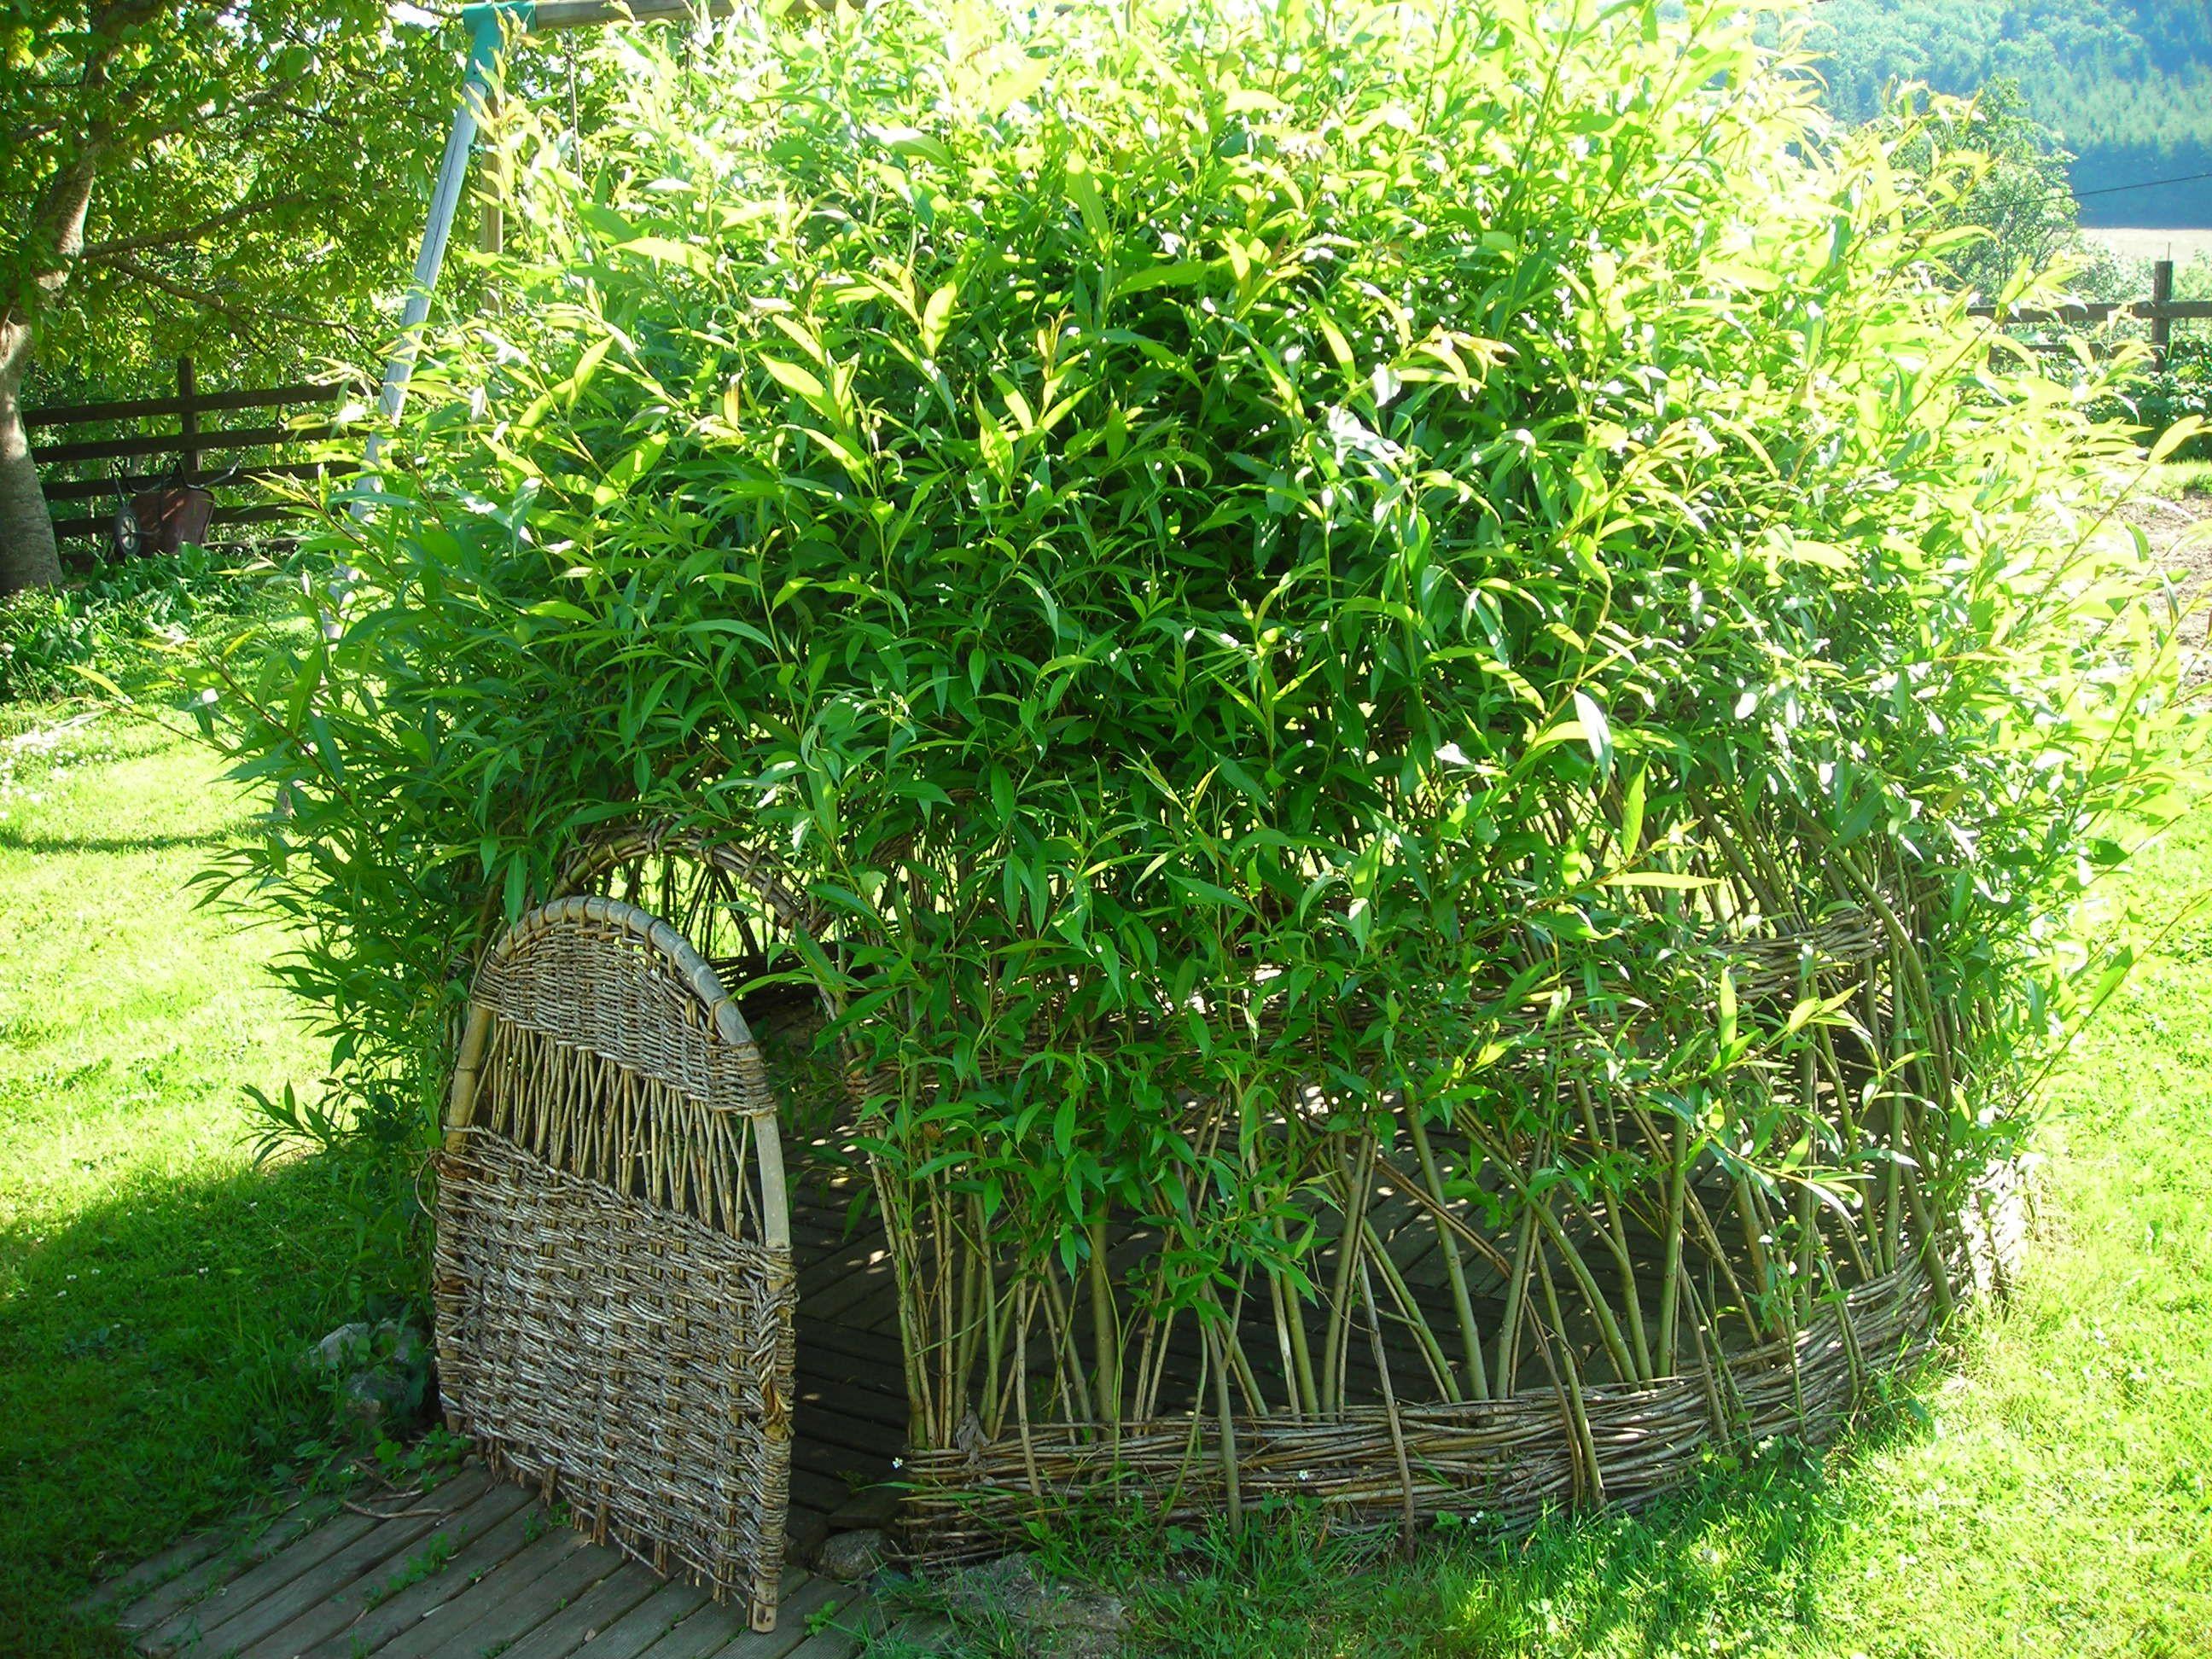 Osier vivant jardin jardins pinterest for Decoration osier pour jardin